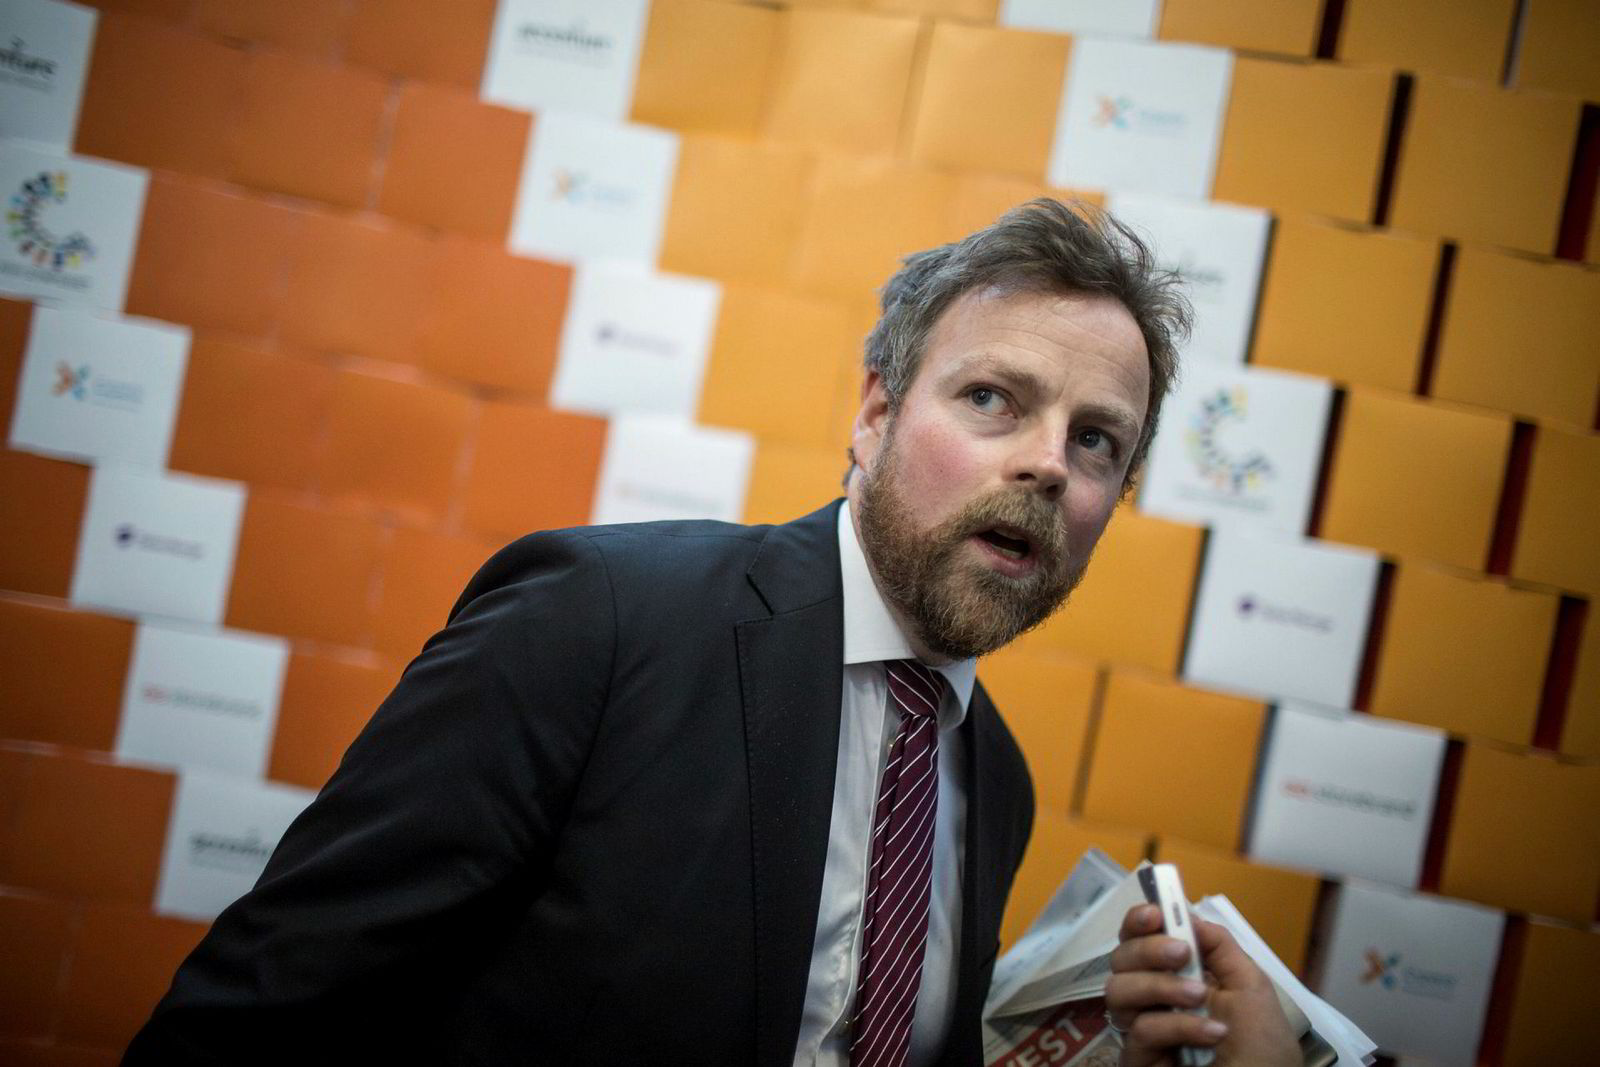 Kunnskapsminister Torbjørn Røe Isaksen under NHH-Symposiet i Bergen i mars.